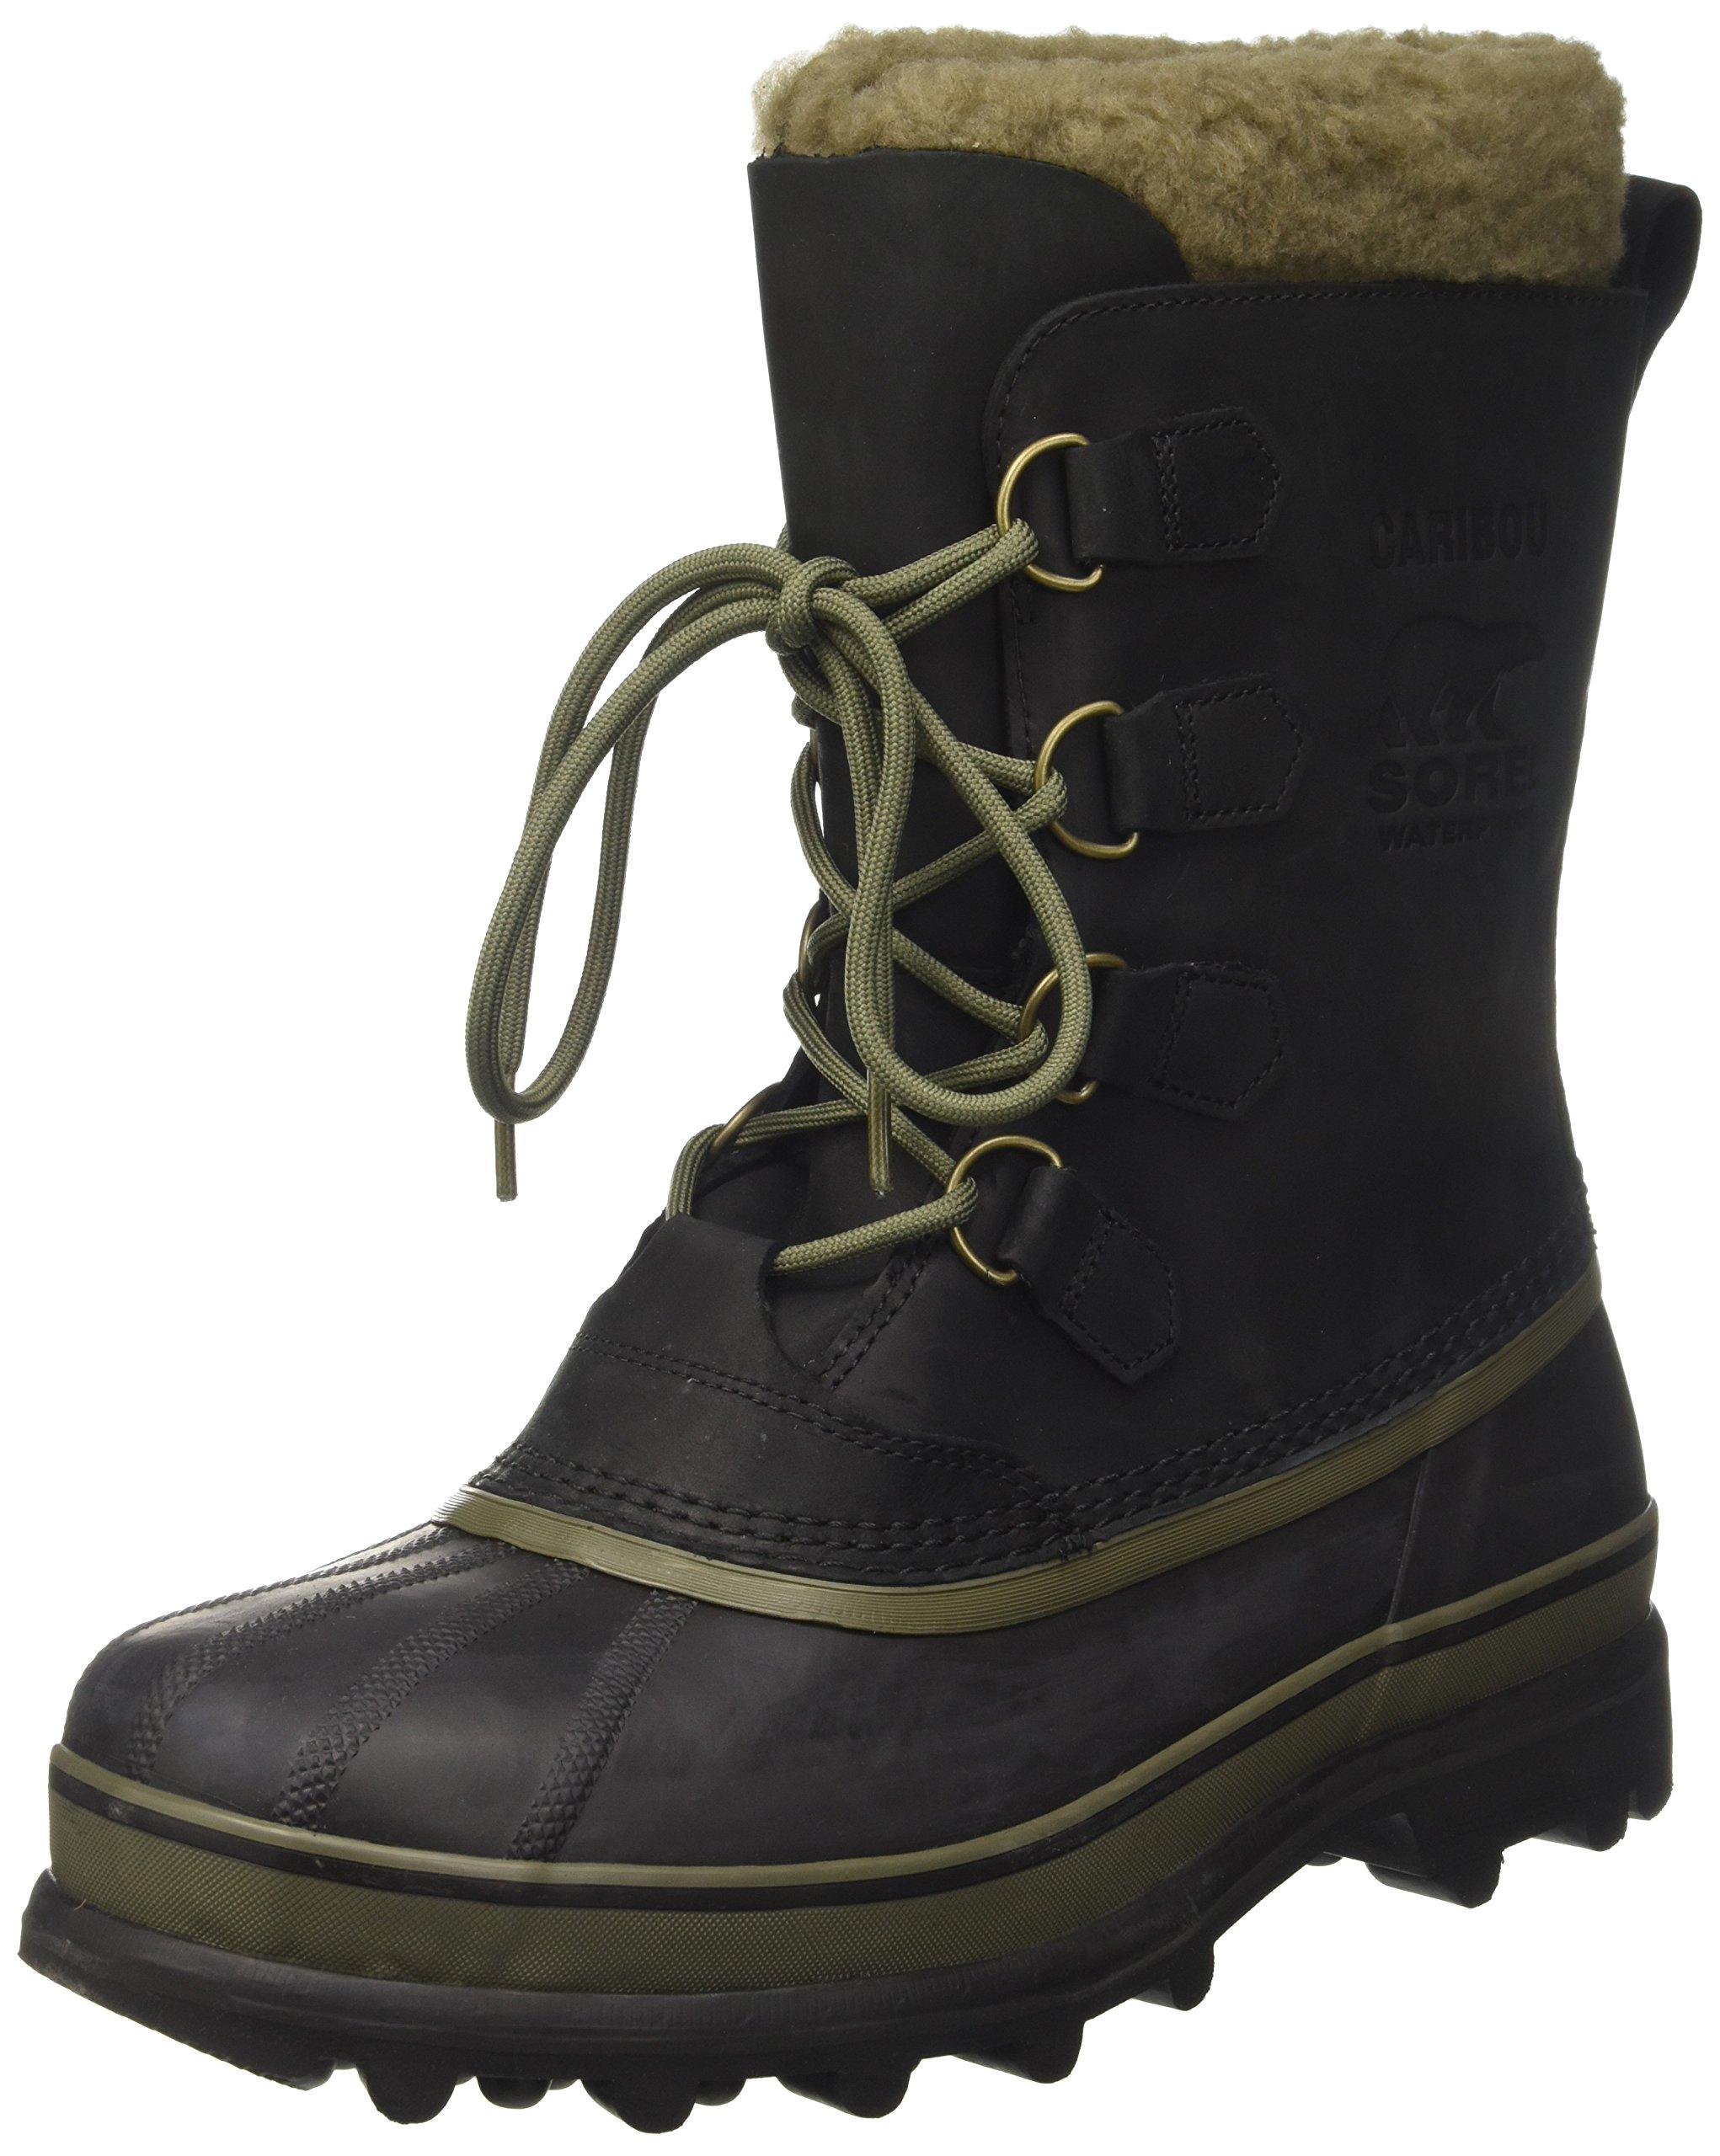 Sorel - Mens Caribou Wl Shell Boot, Size: 11 D(M) US, Color: Black/Nori